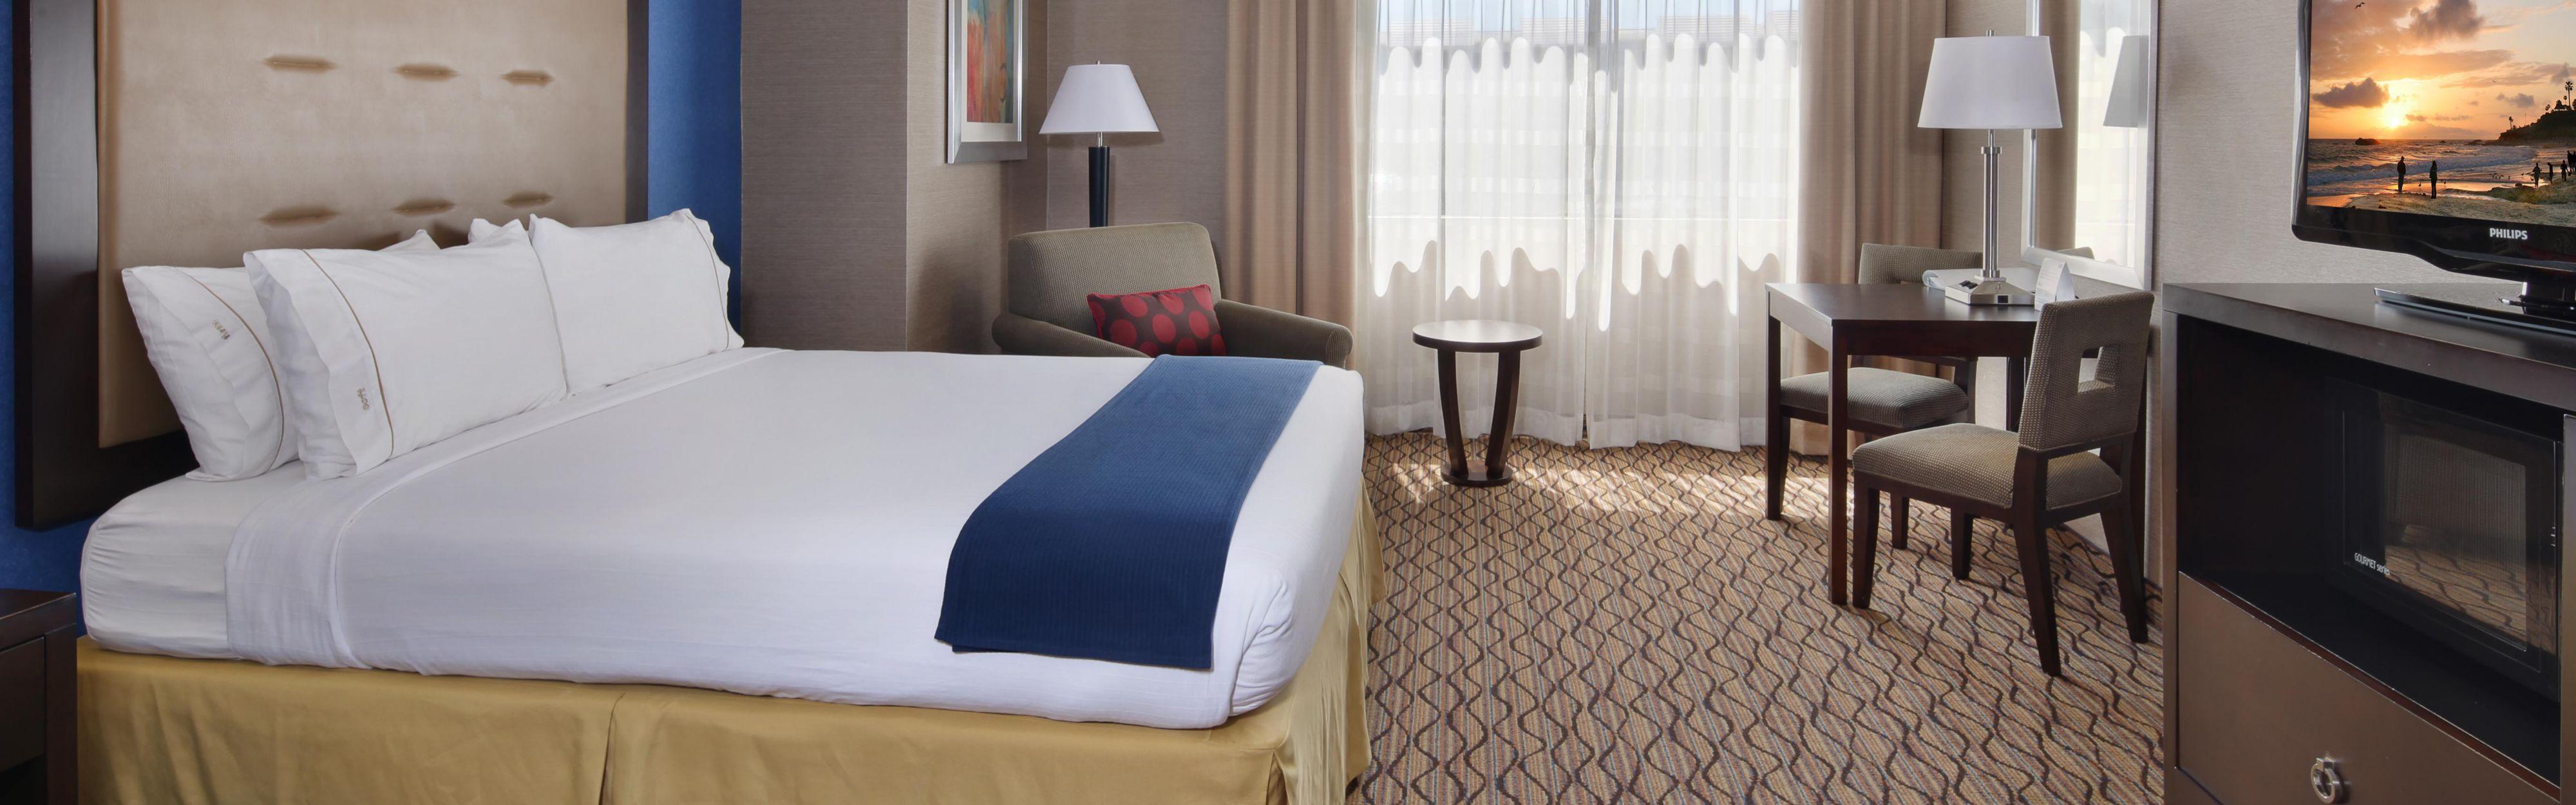 Holiday Inn Express Port Hueneme image 1